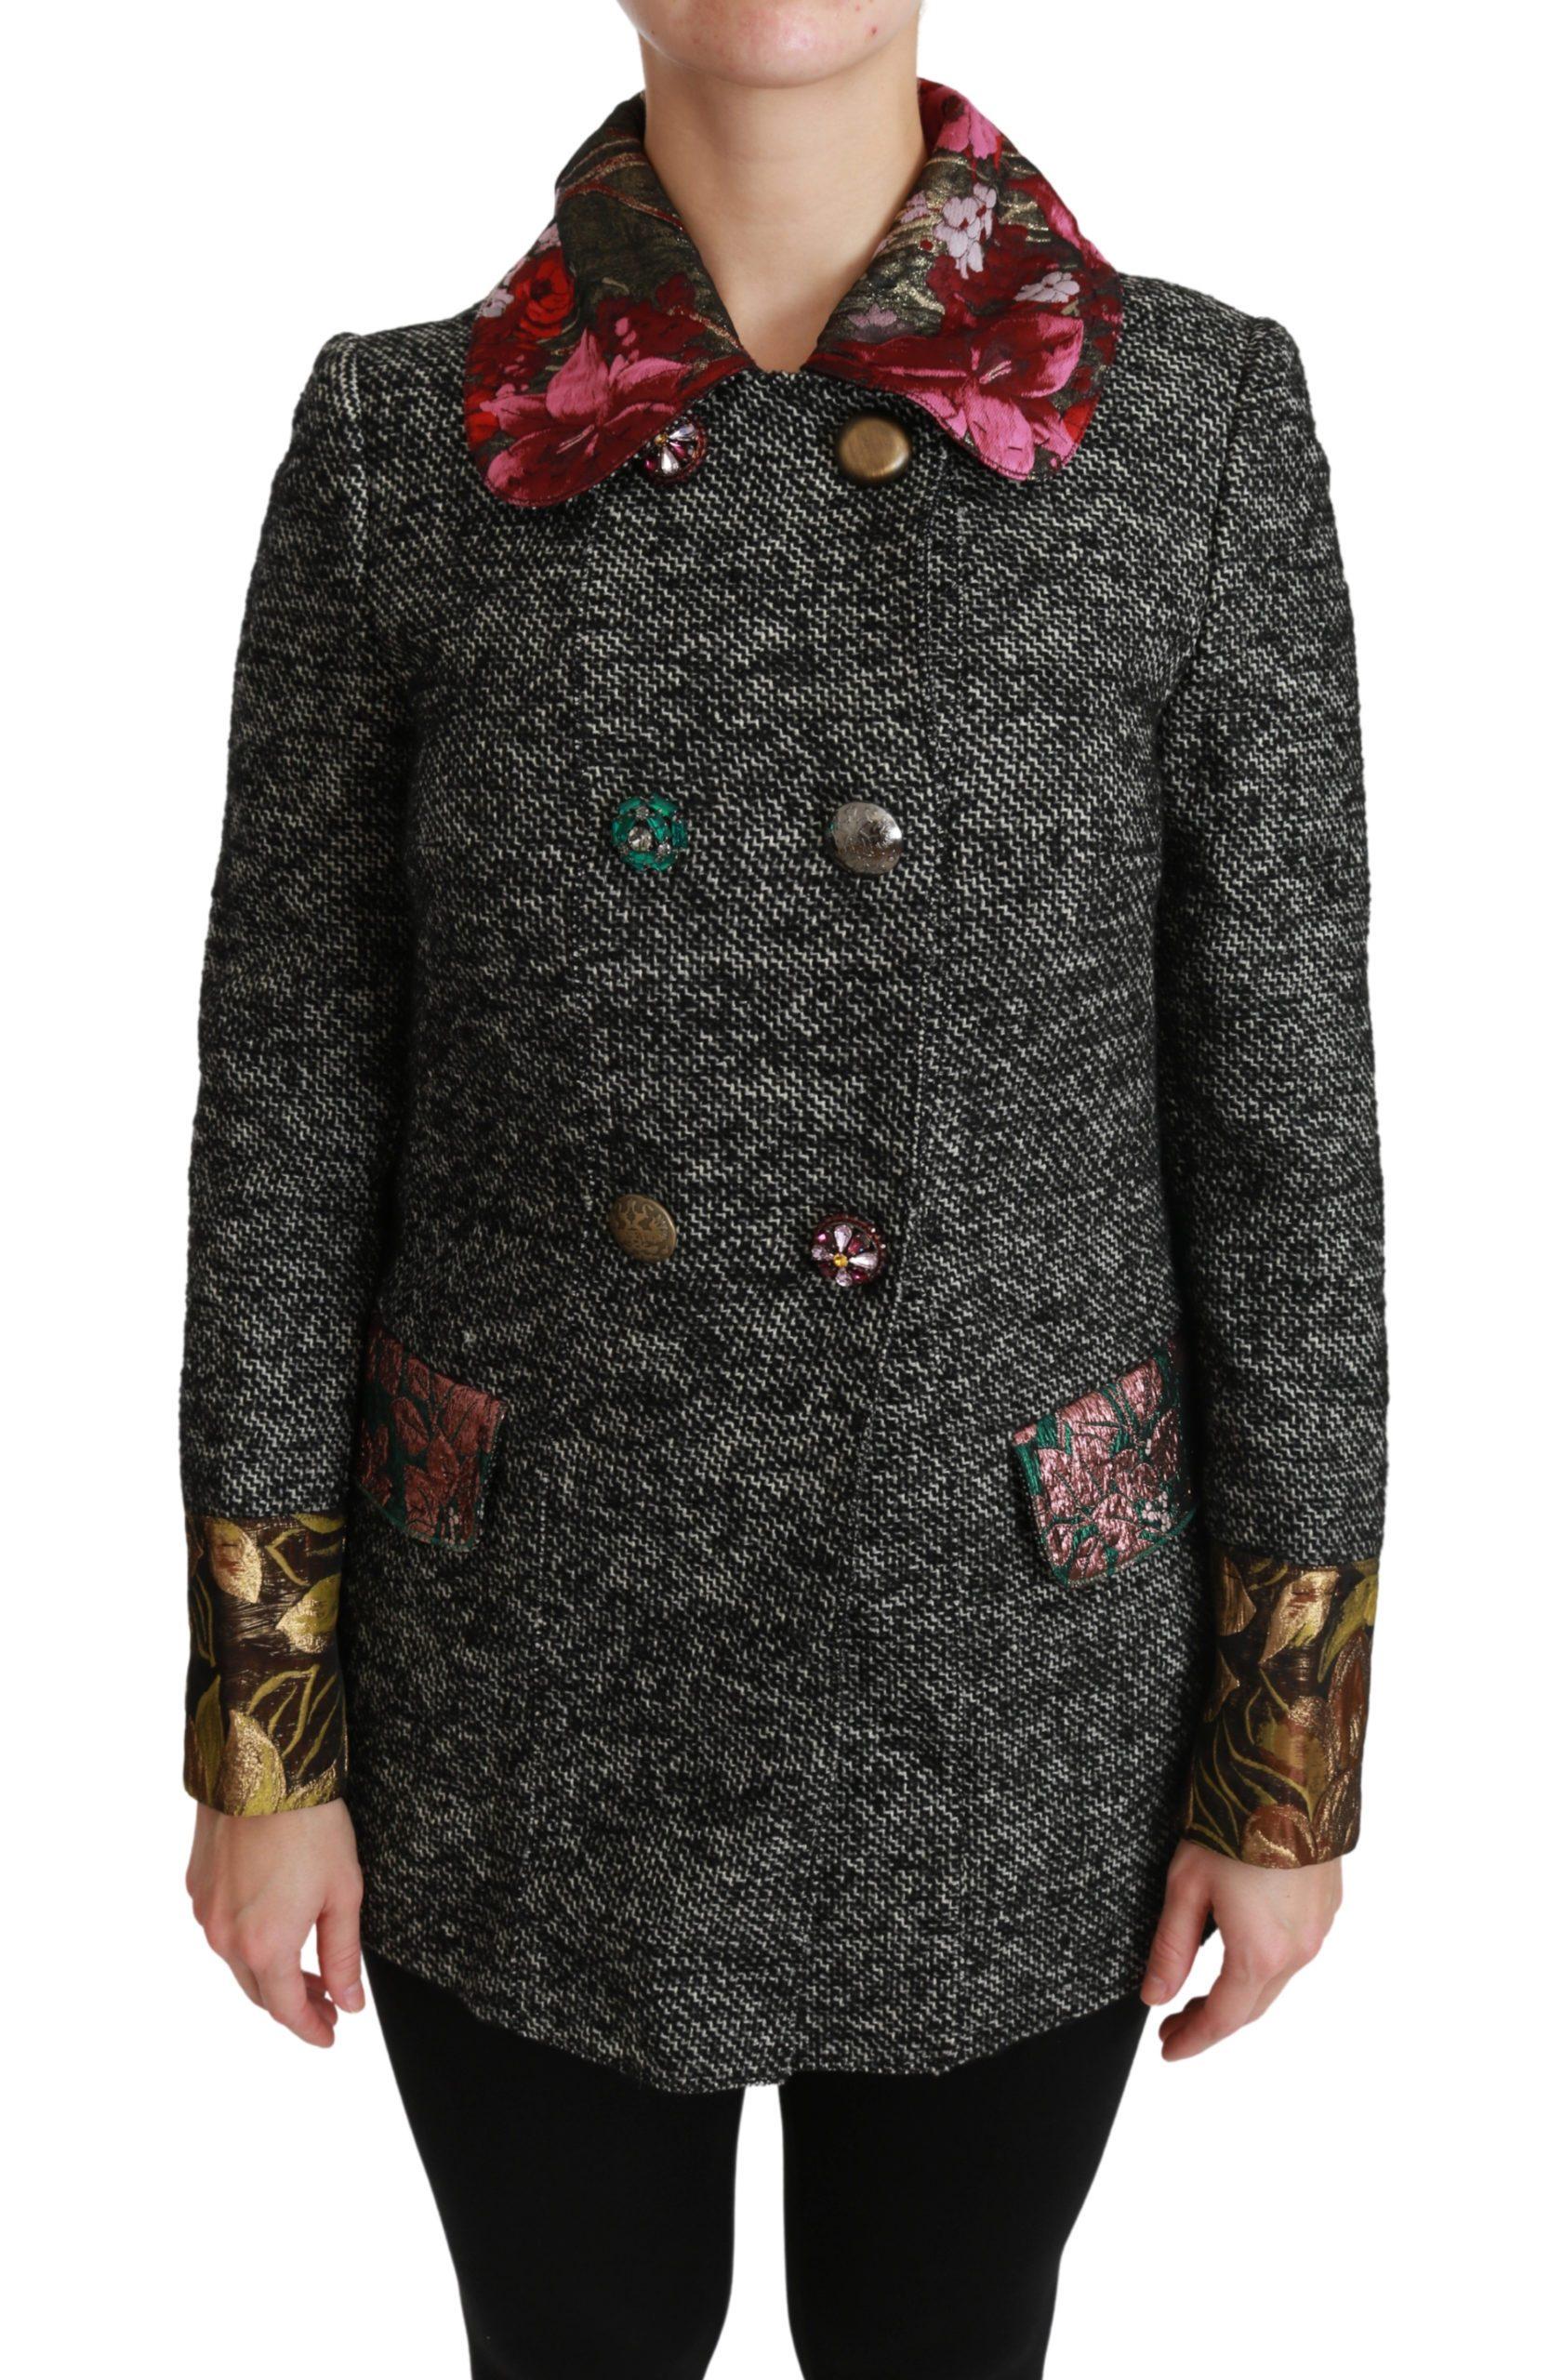 Dolce & Gabbana Women's Crystal Double Breasted Coat Gray JKT2522 - IT38|XS